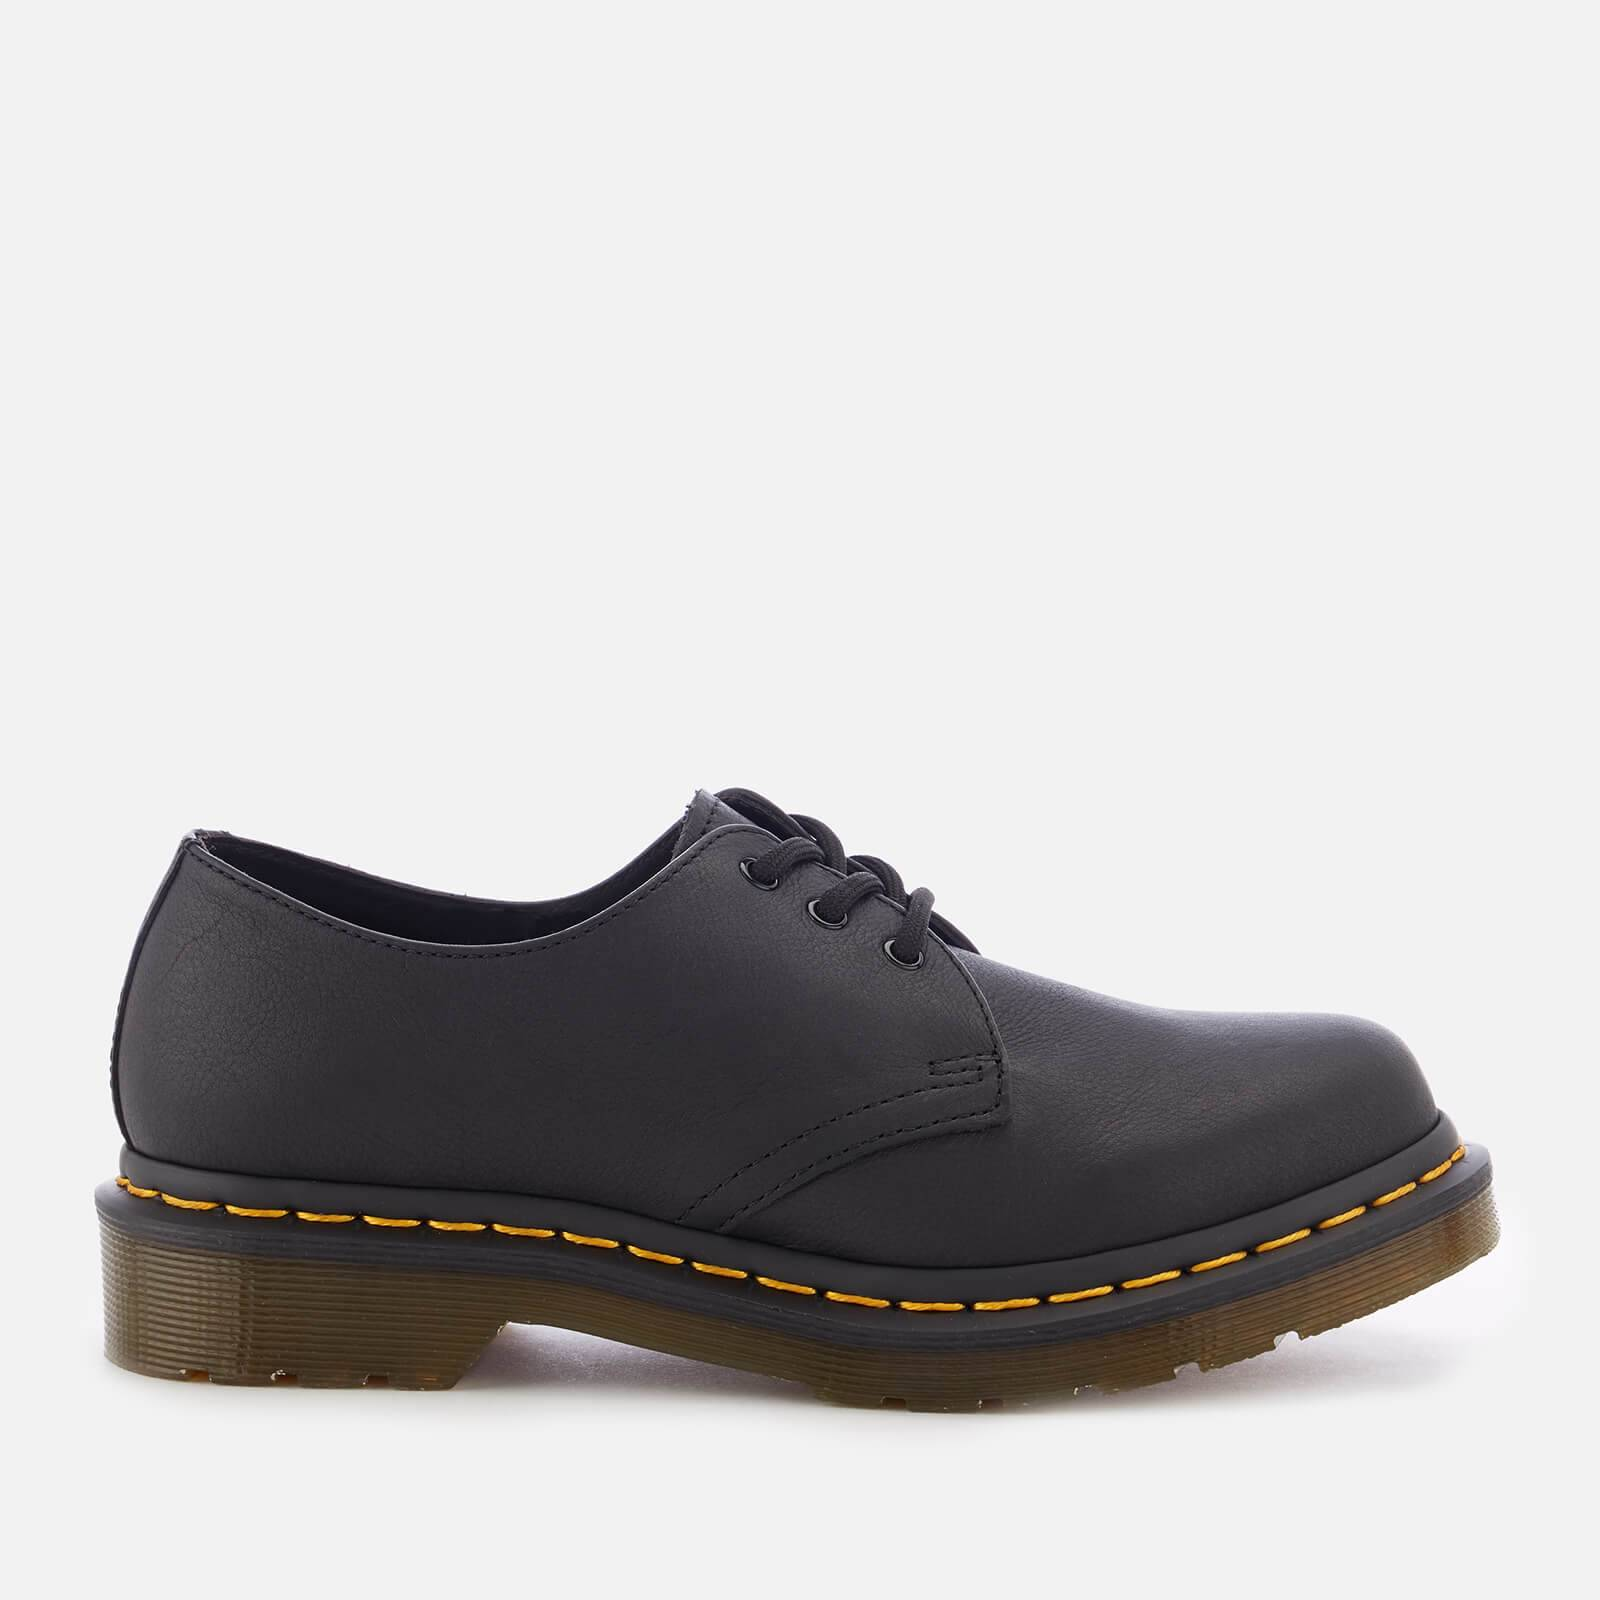 Dr. Martens Women's 1461 W Virginia Leather 3-Eye Shoes - Black - UK 4 - Black